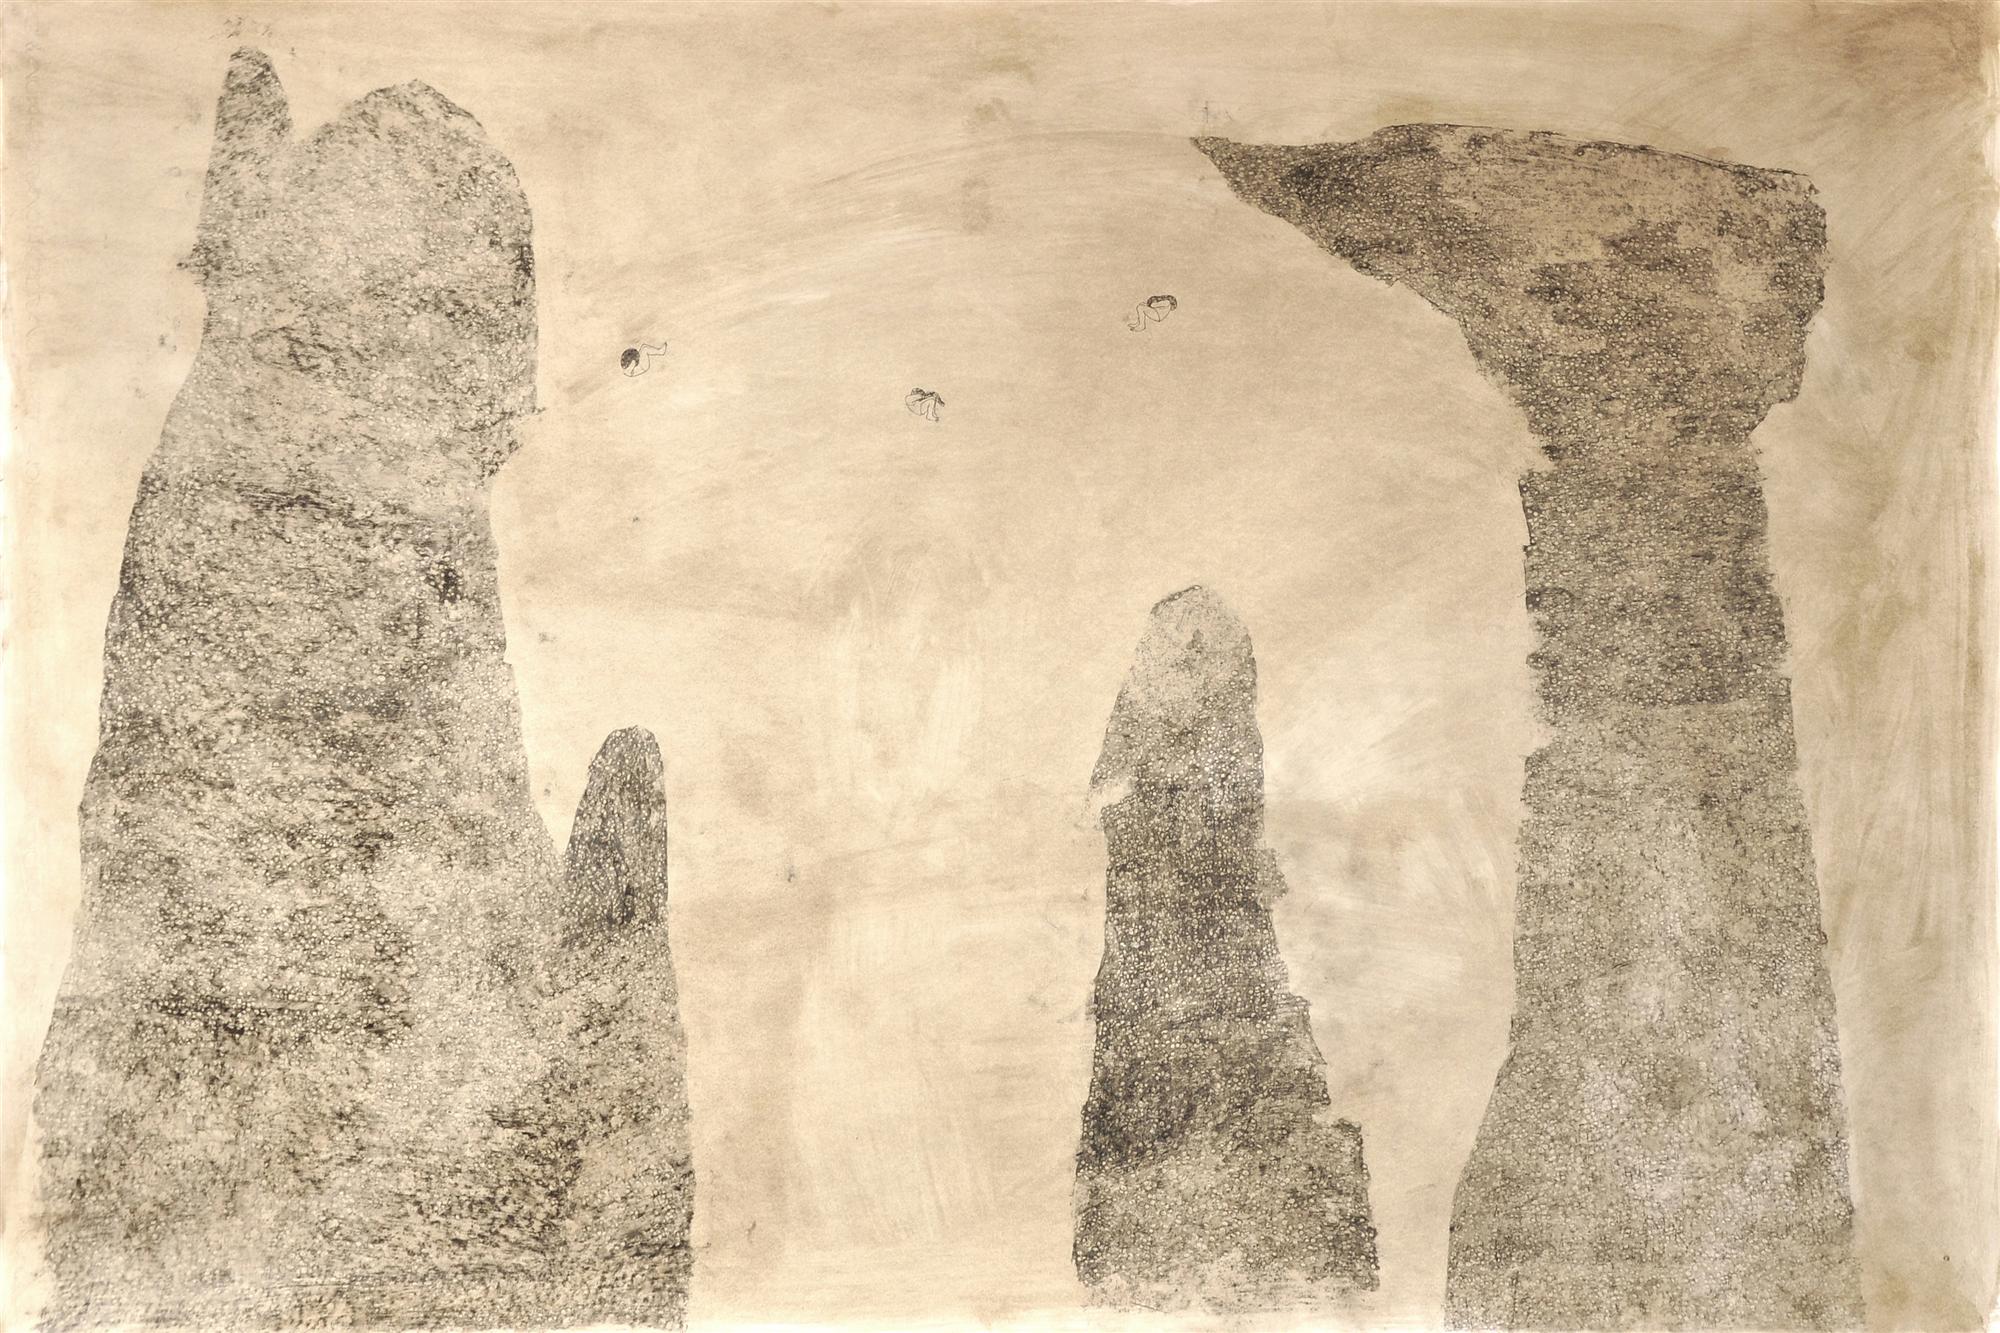 PREMIO ORIENTALMENTE Elisa Bertaglia, Alma Venus et Venatrix Diana, 100x150 cm, olio, carboncino e grafite su carta, 2013